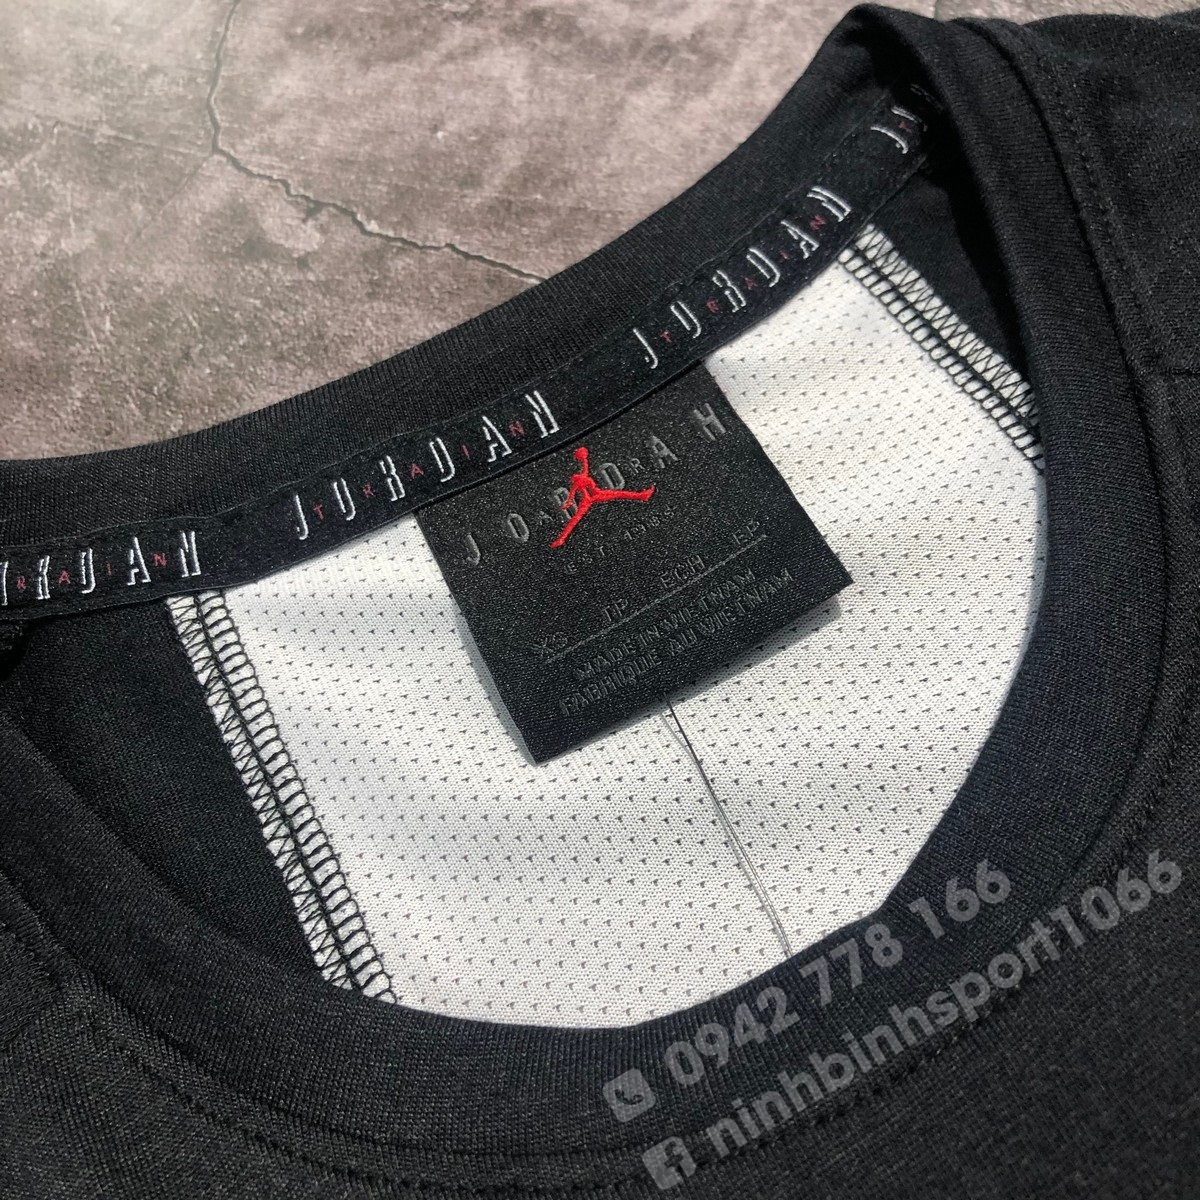 Áo thể thao nam Nike Jordan 23 Alpha 889713-013